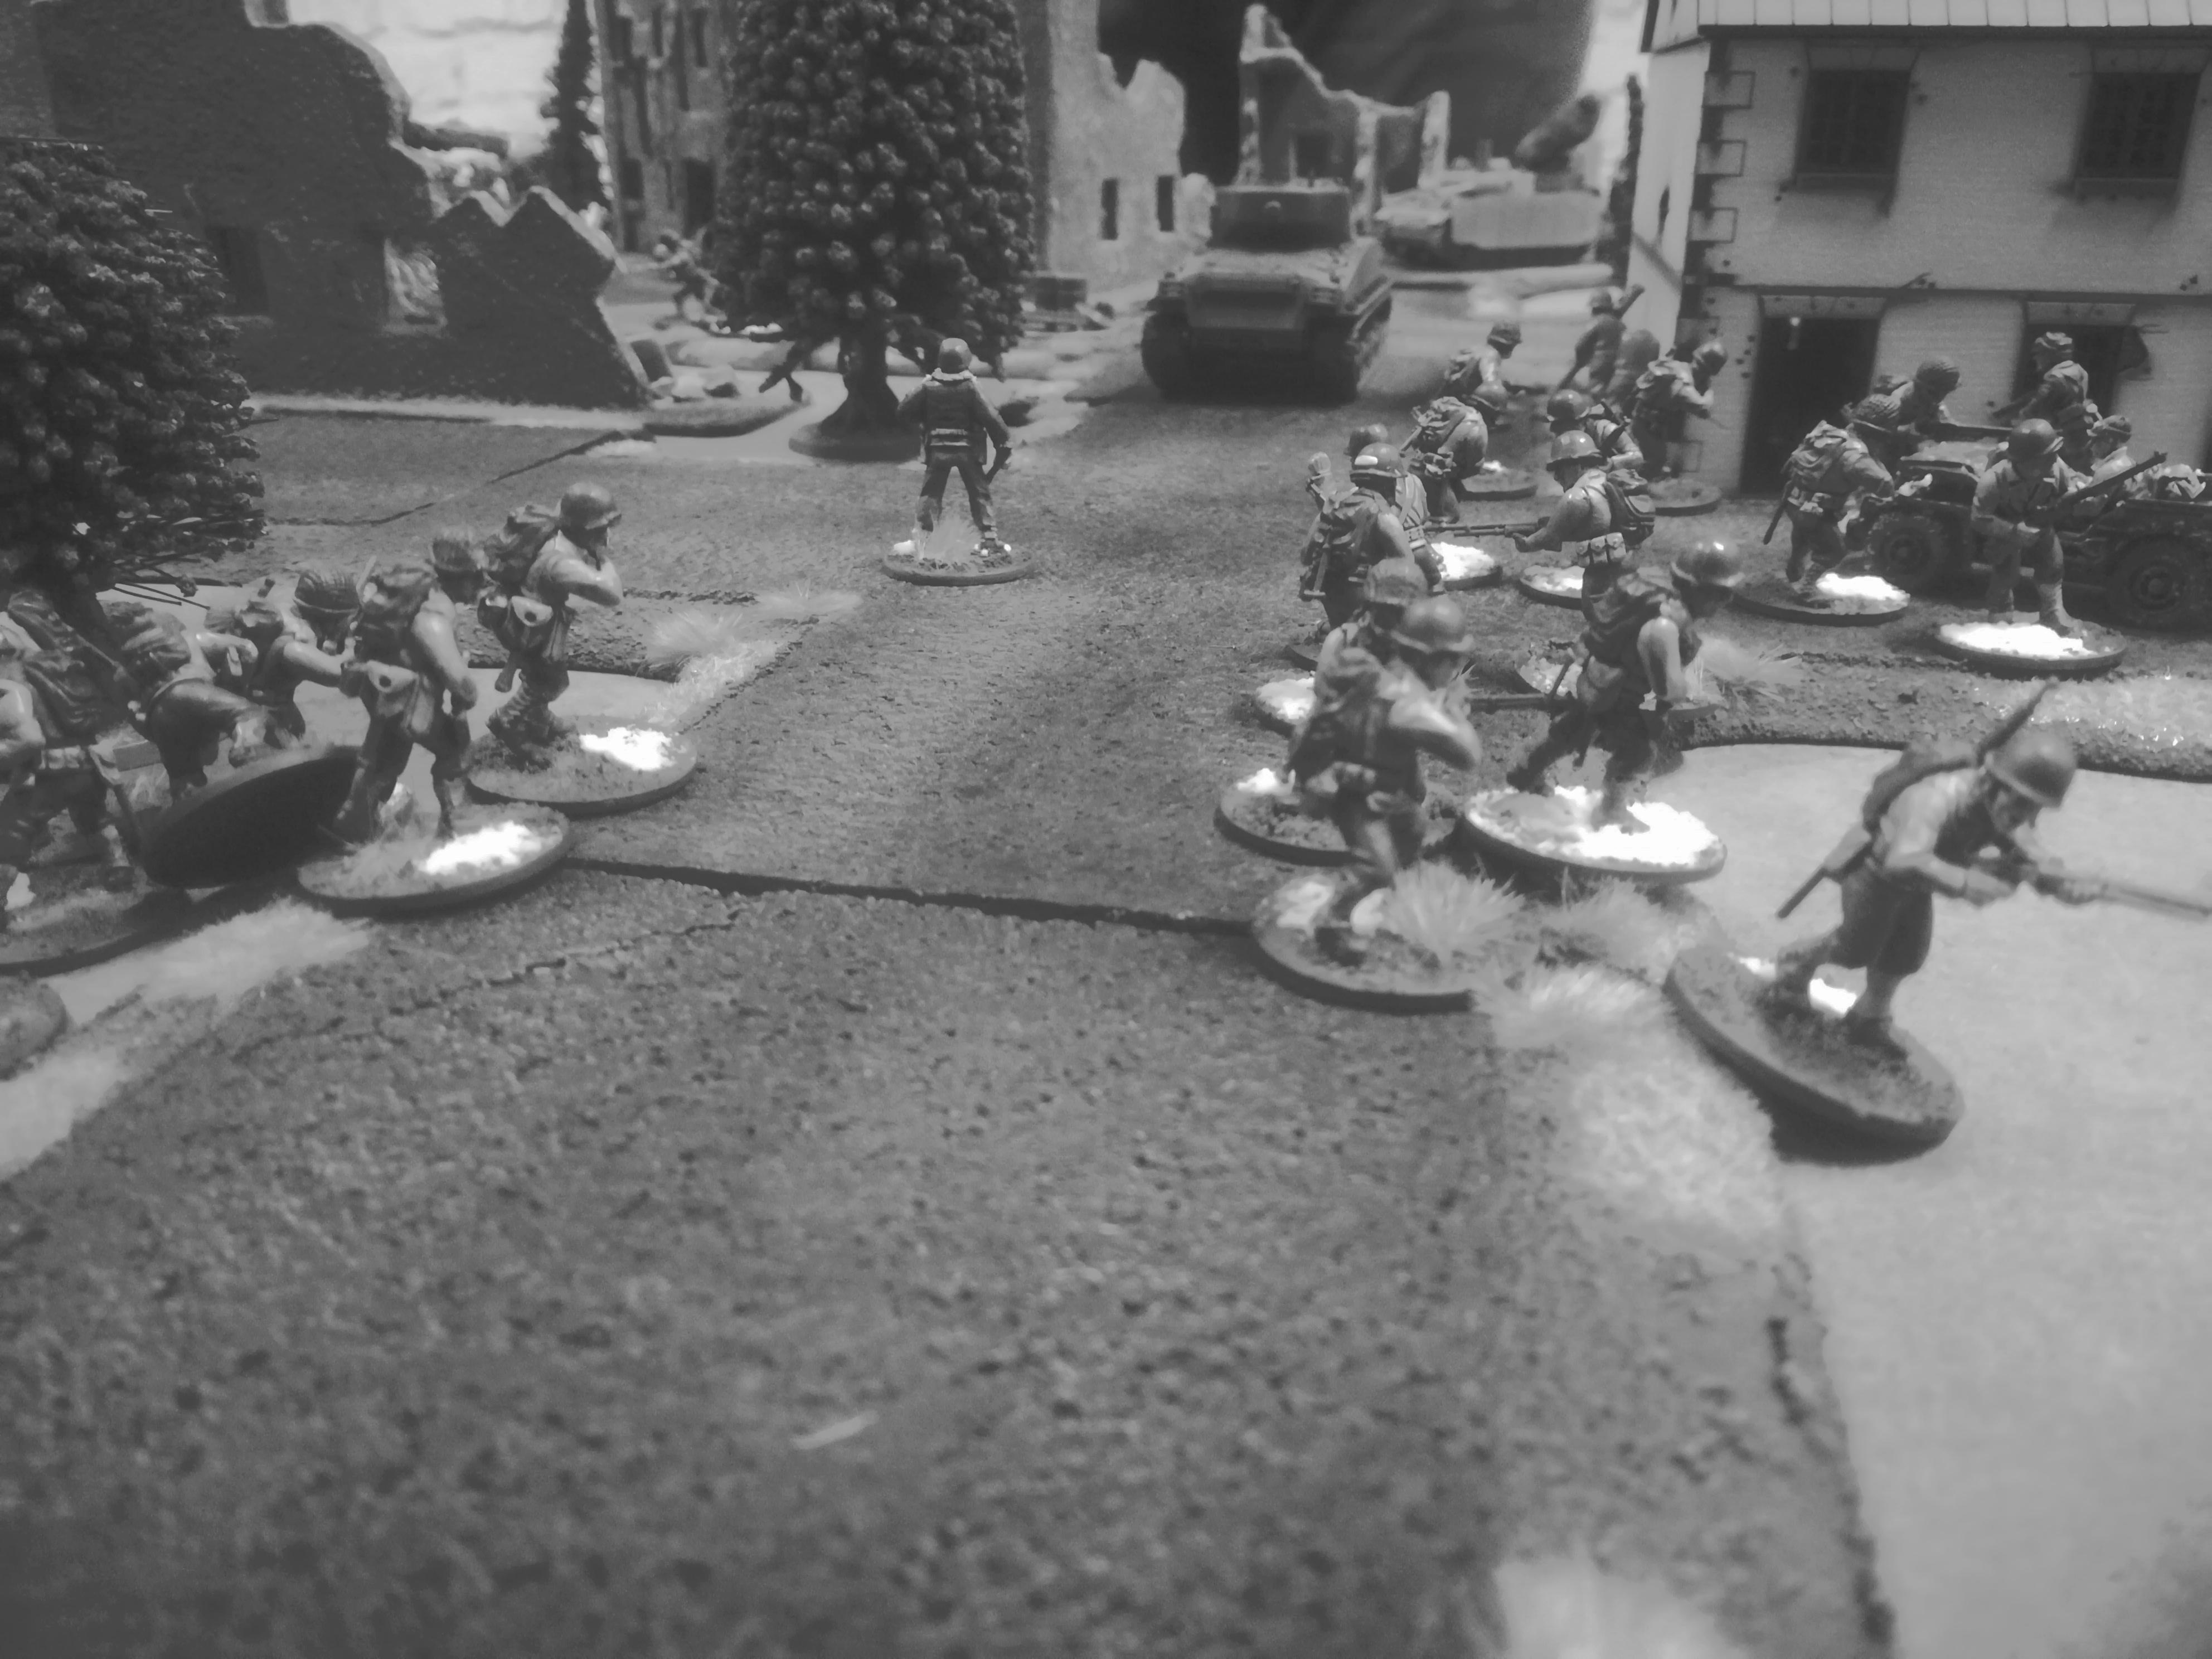 White Fire Batalion versus Regio XXI in a fierce infantry engagement